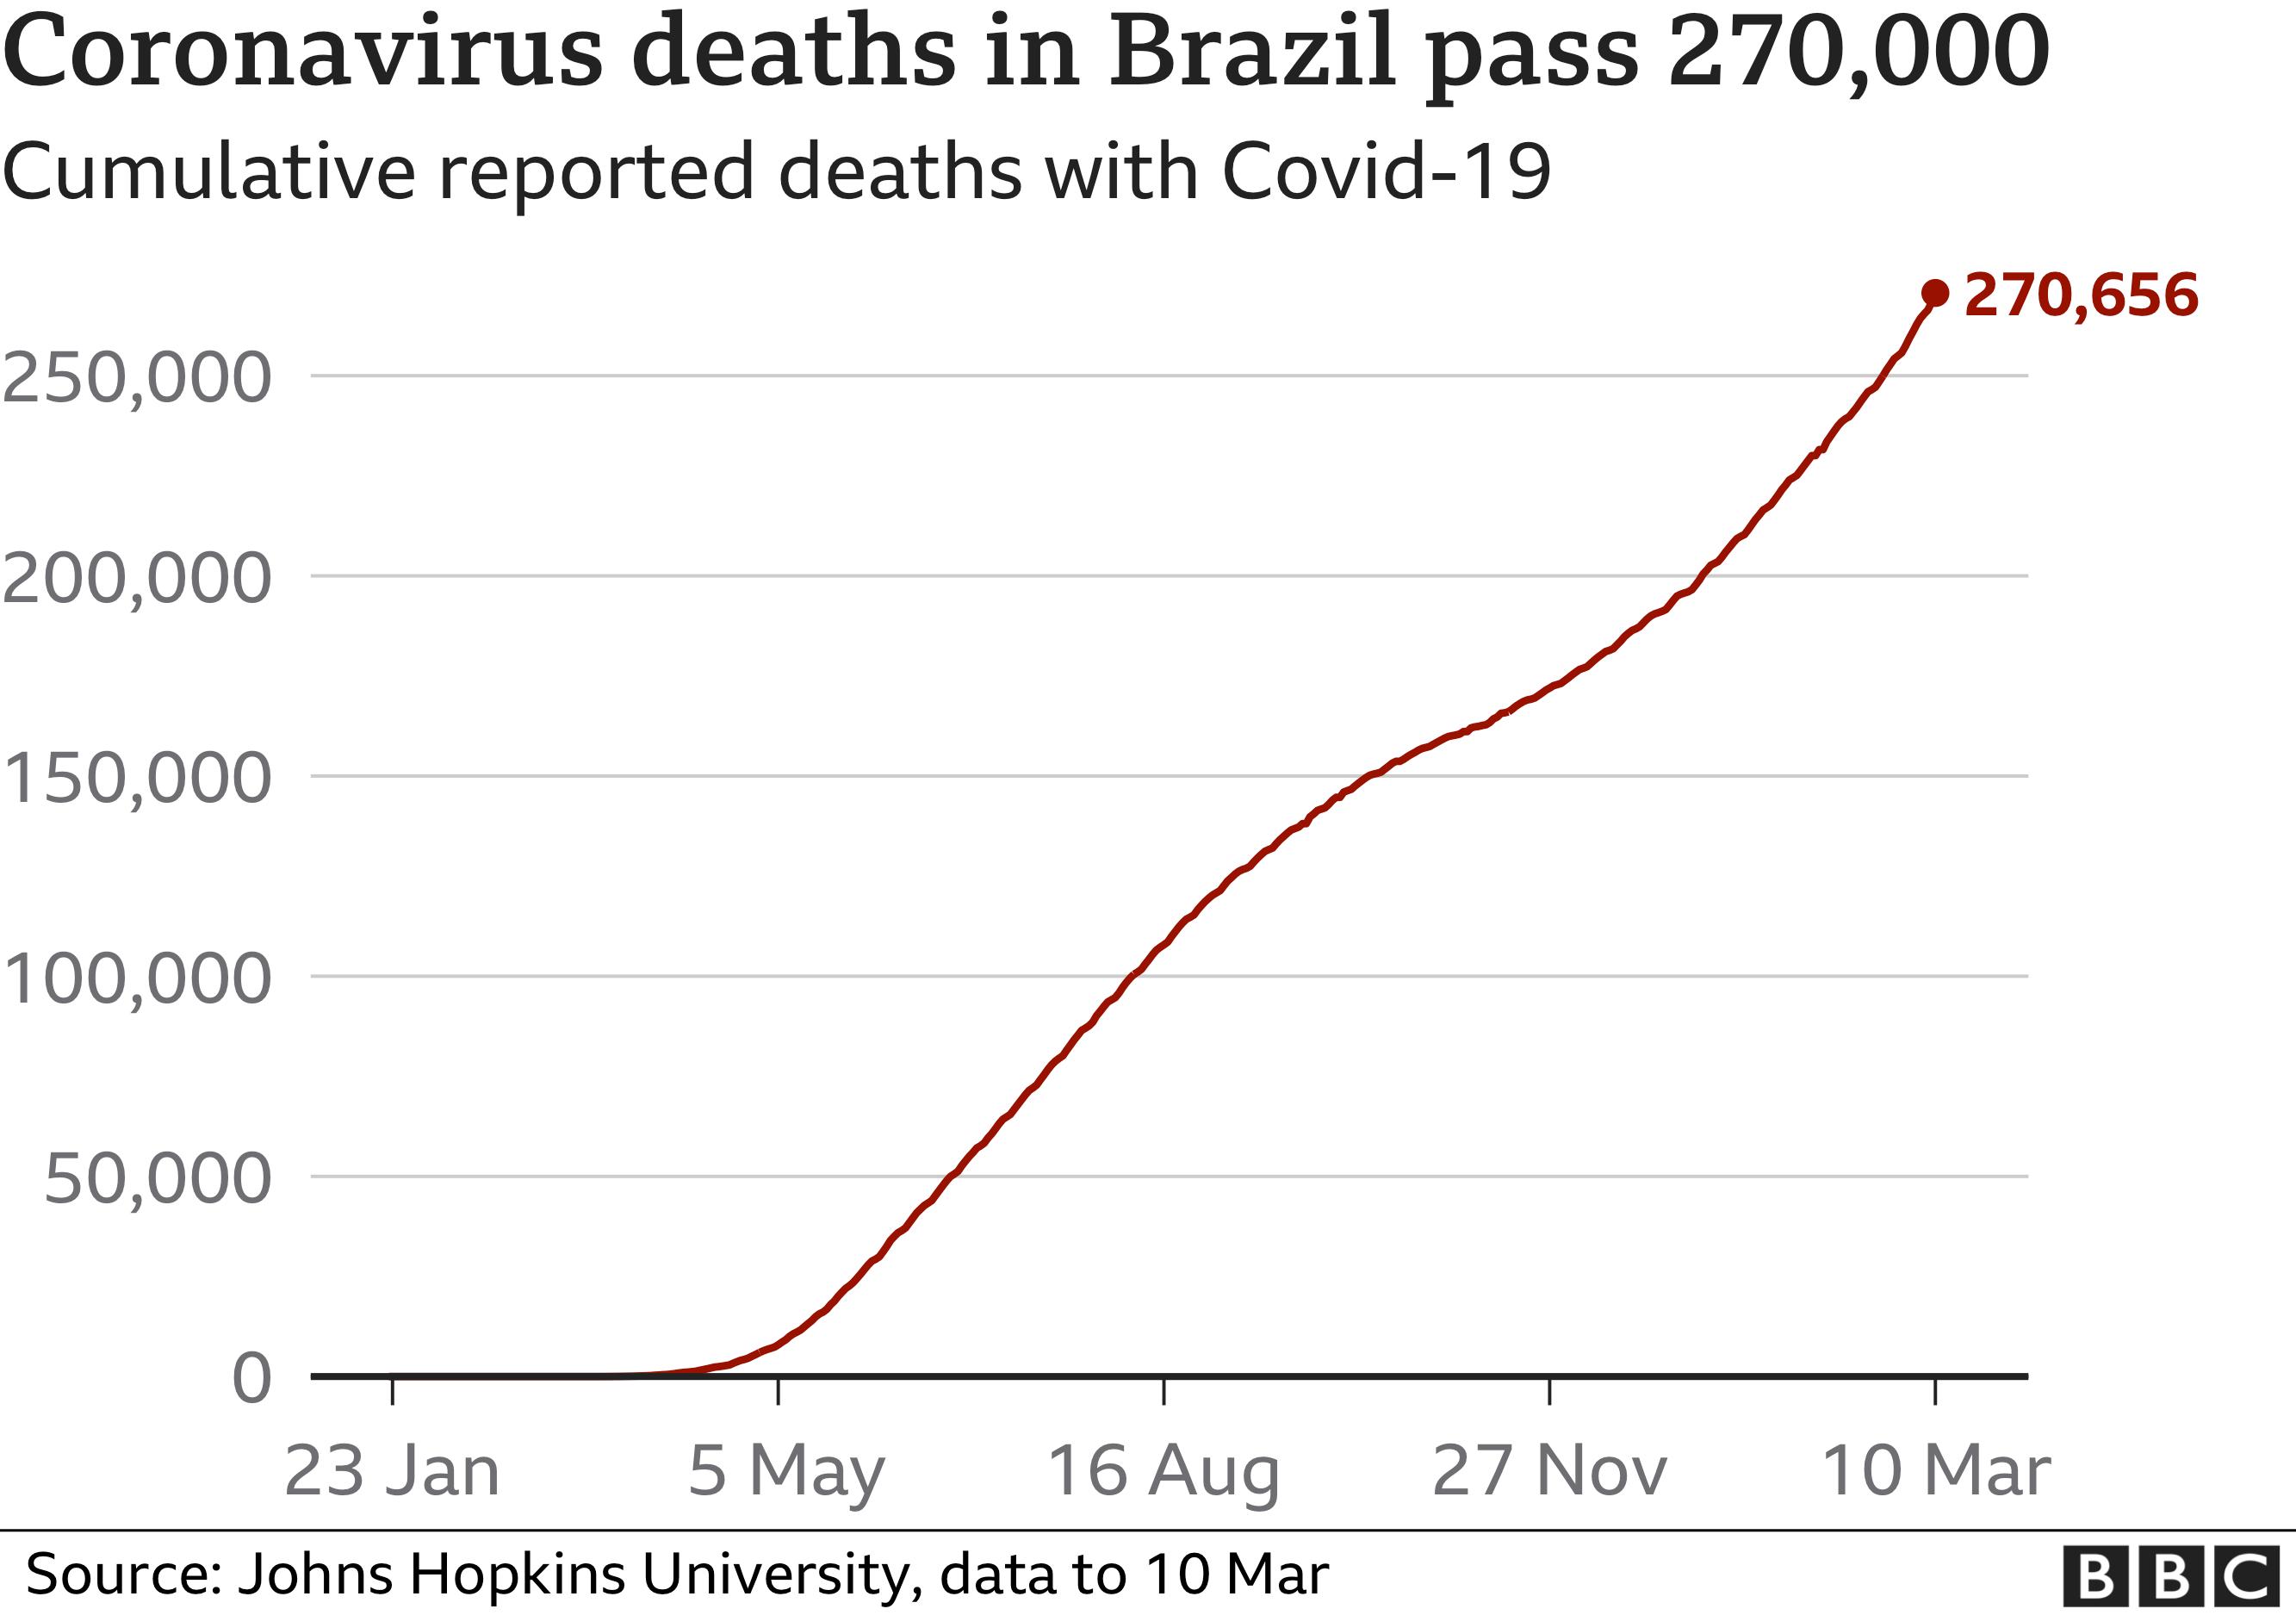 Chart showing cumulative coronavirus deaths in Brazil